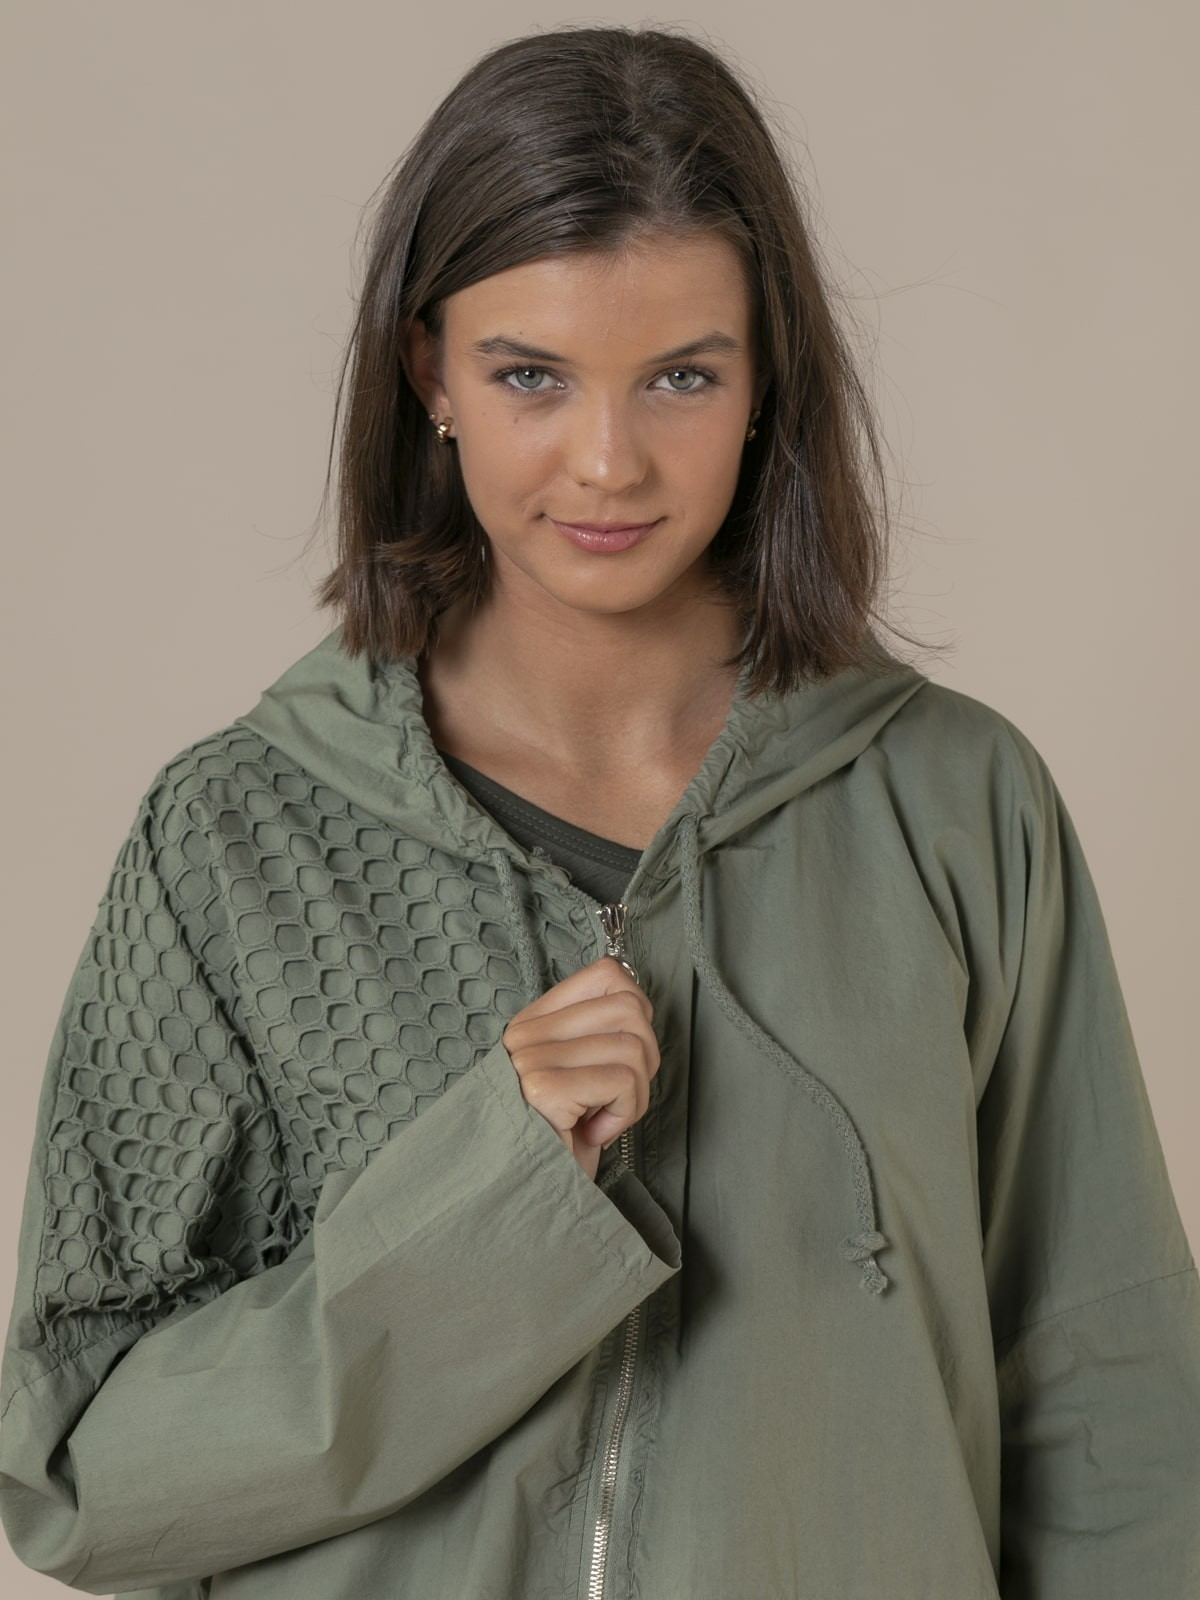 Woman Plain parka with net detail Khaki